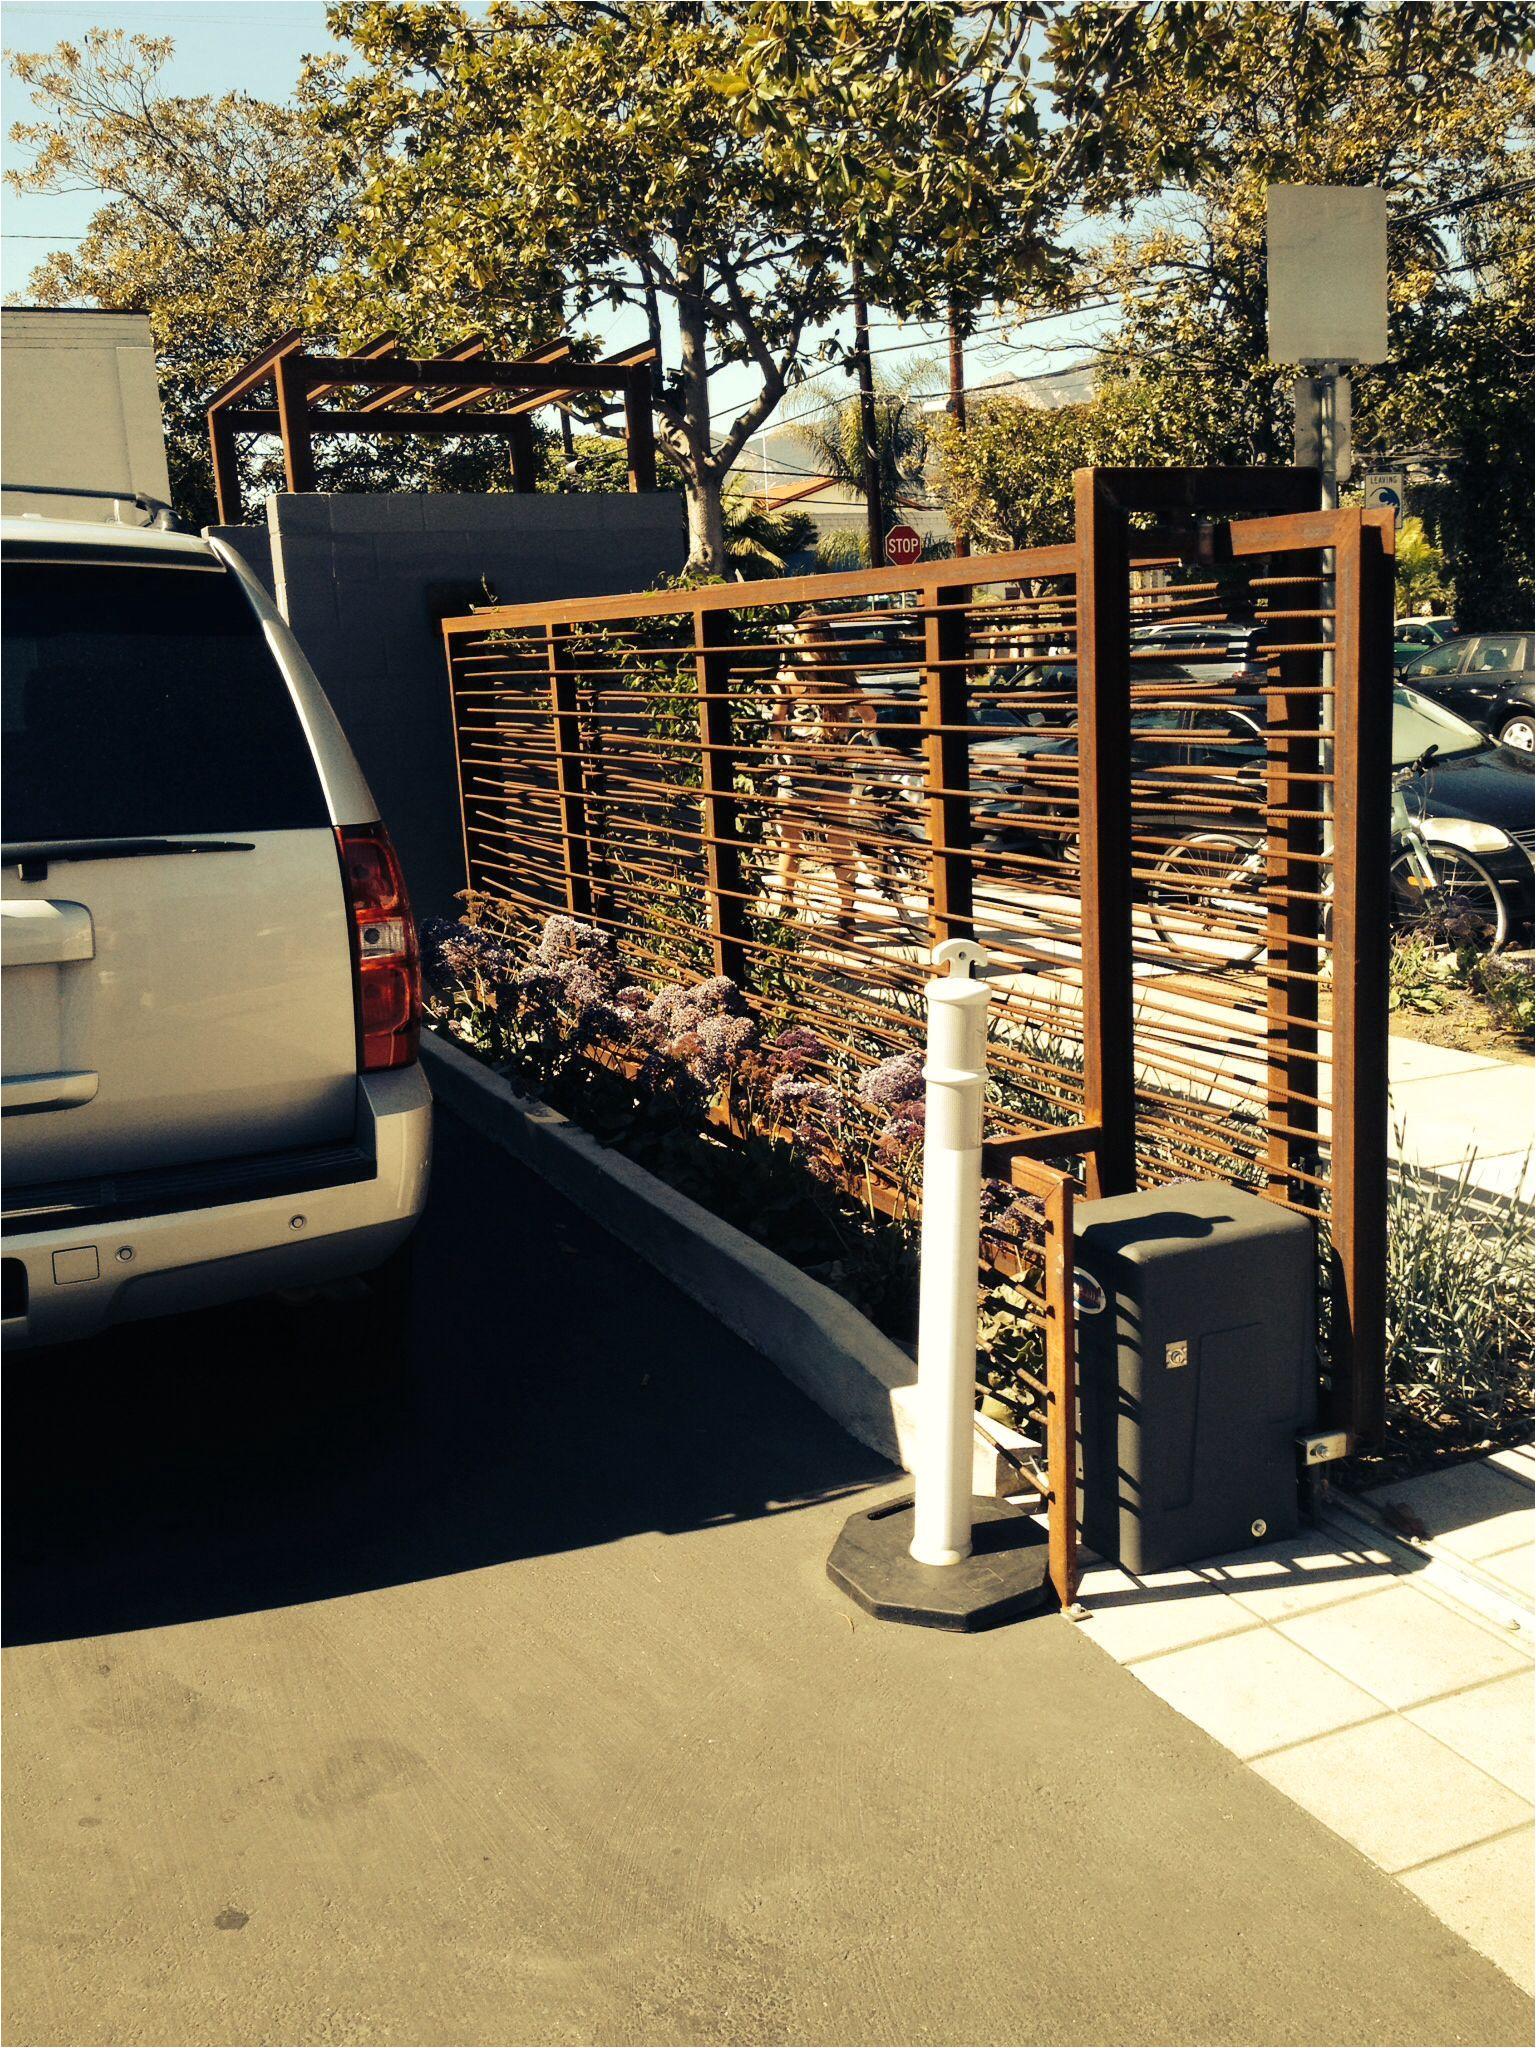 8 astounding diy ideas pallet fence on a slope black fence lattice chain link fence pretty vinyl fence panels dog fence people